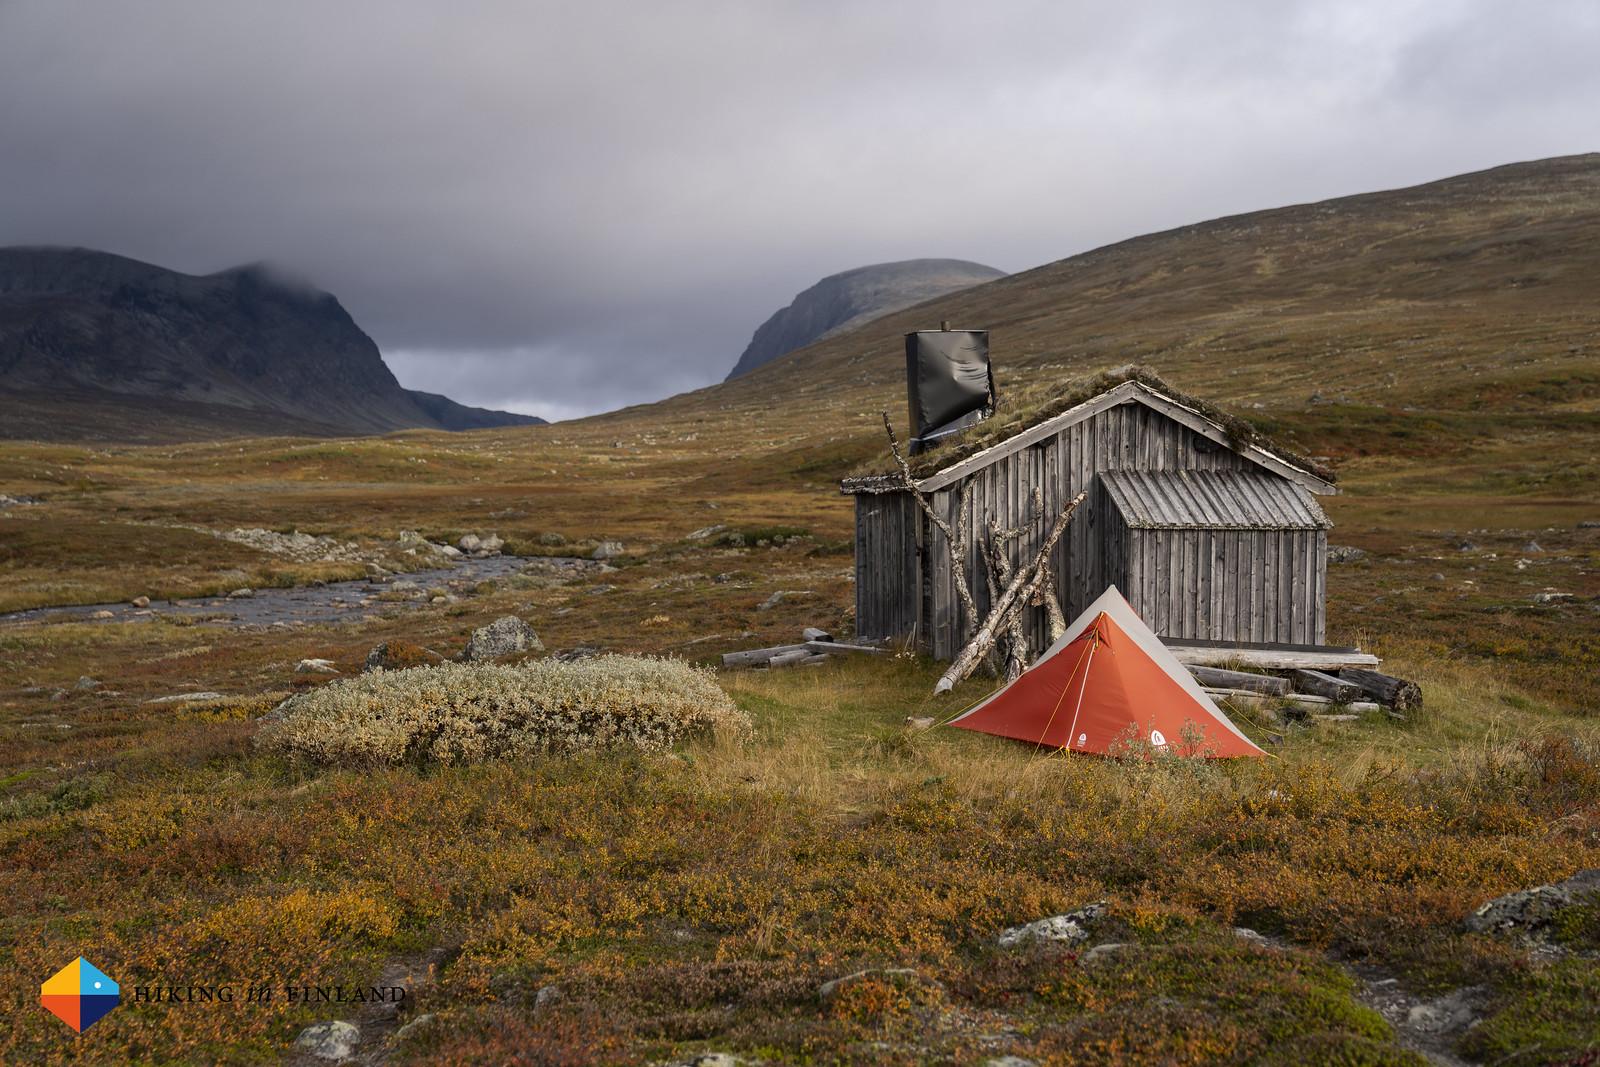 2nd Camp